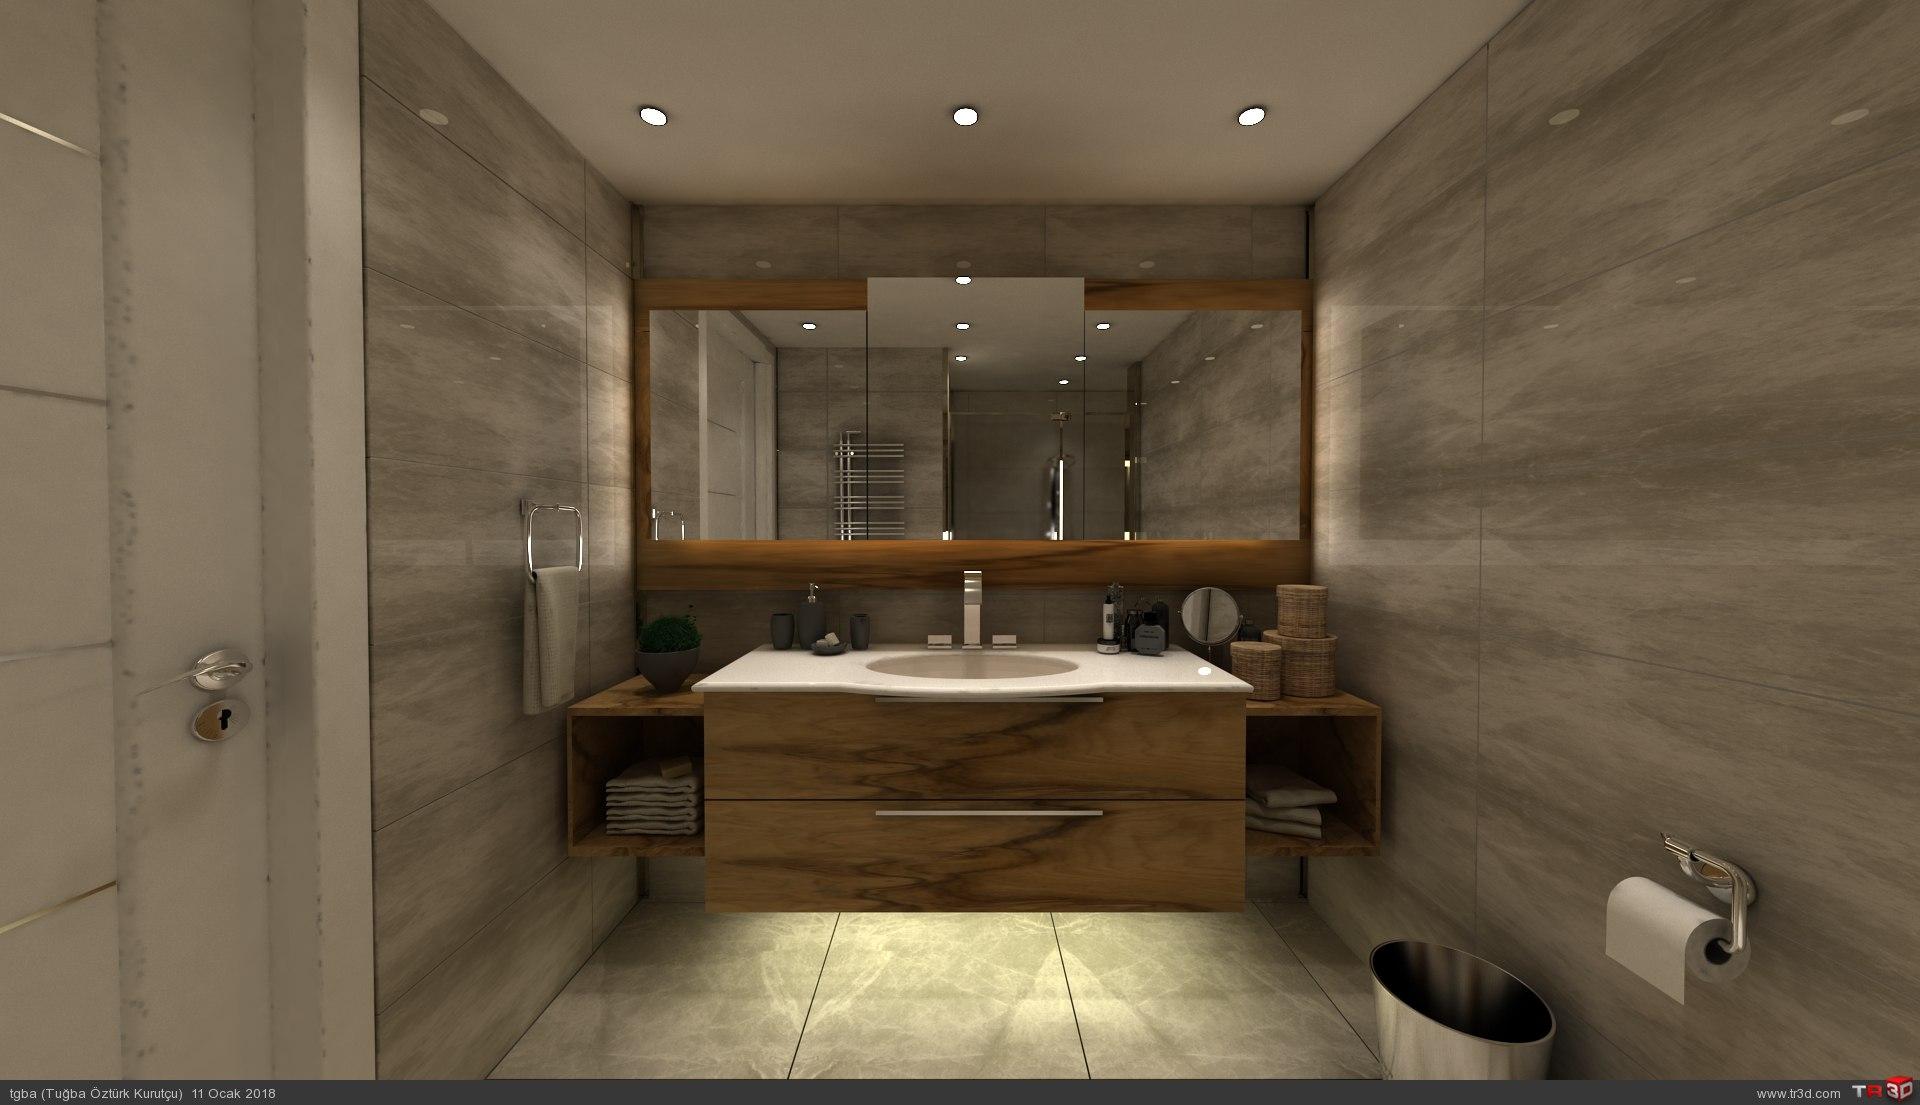 Banyo/bathroom Sade